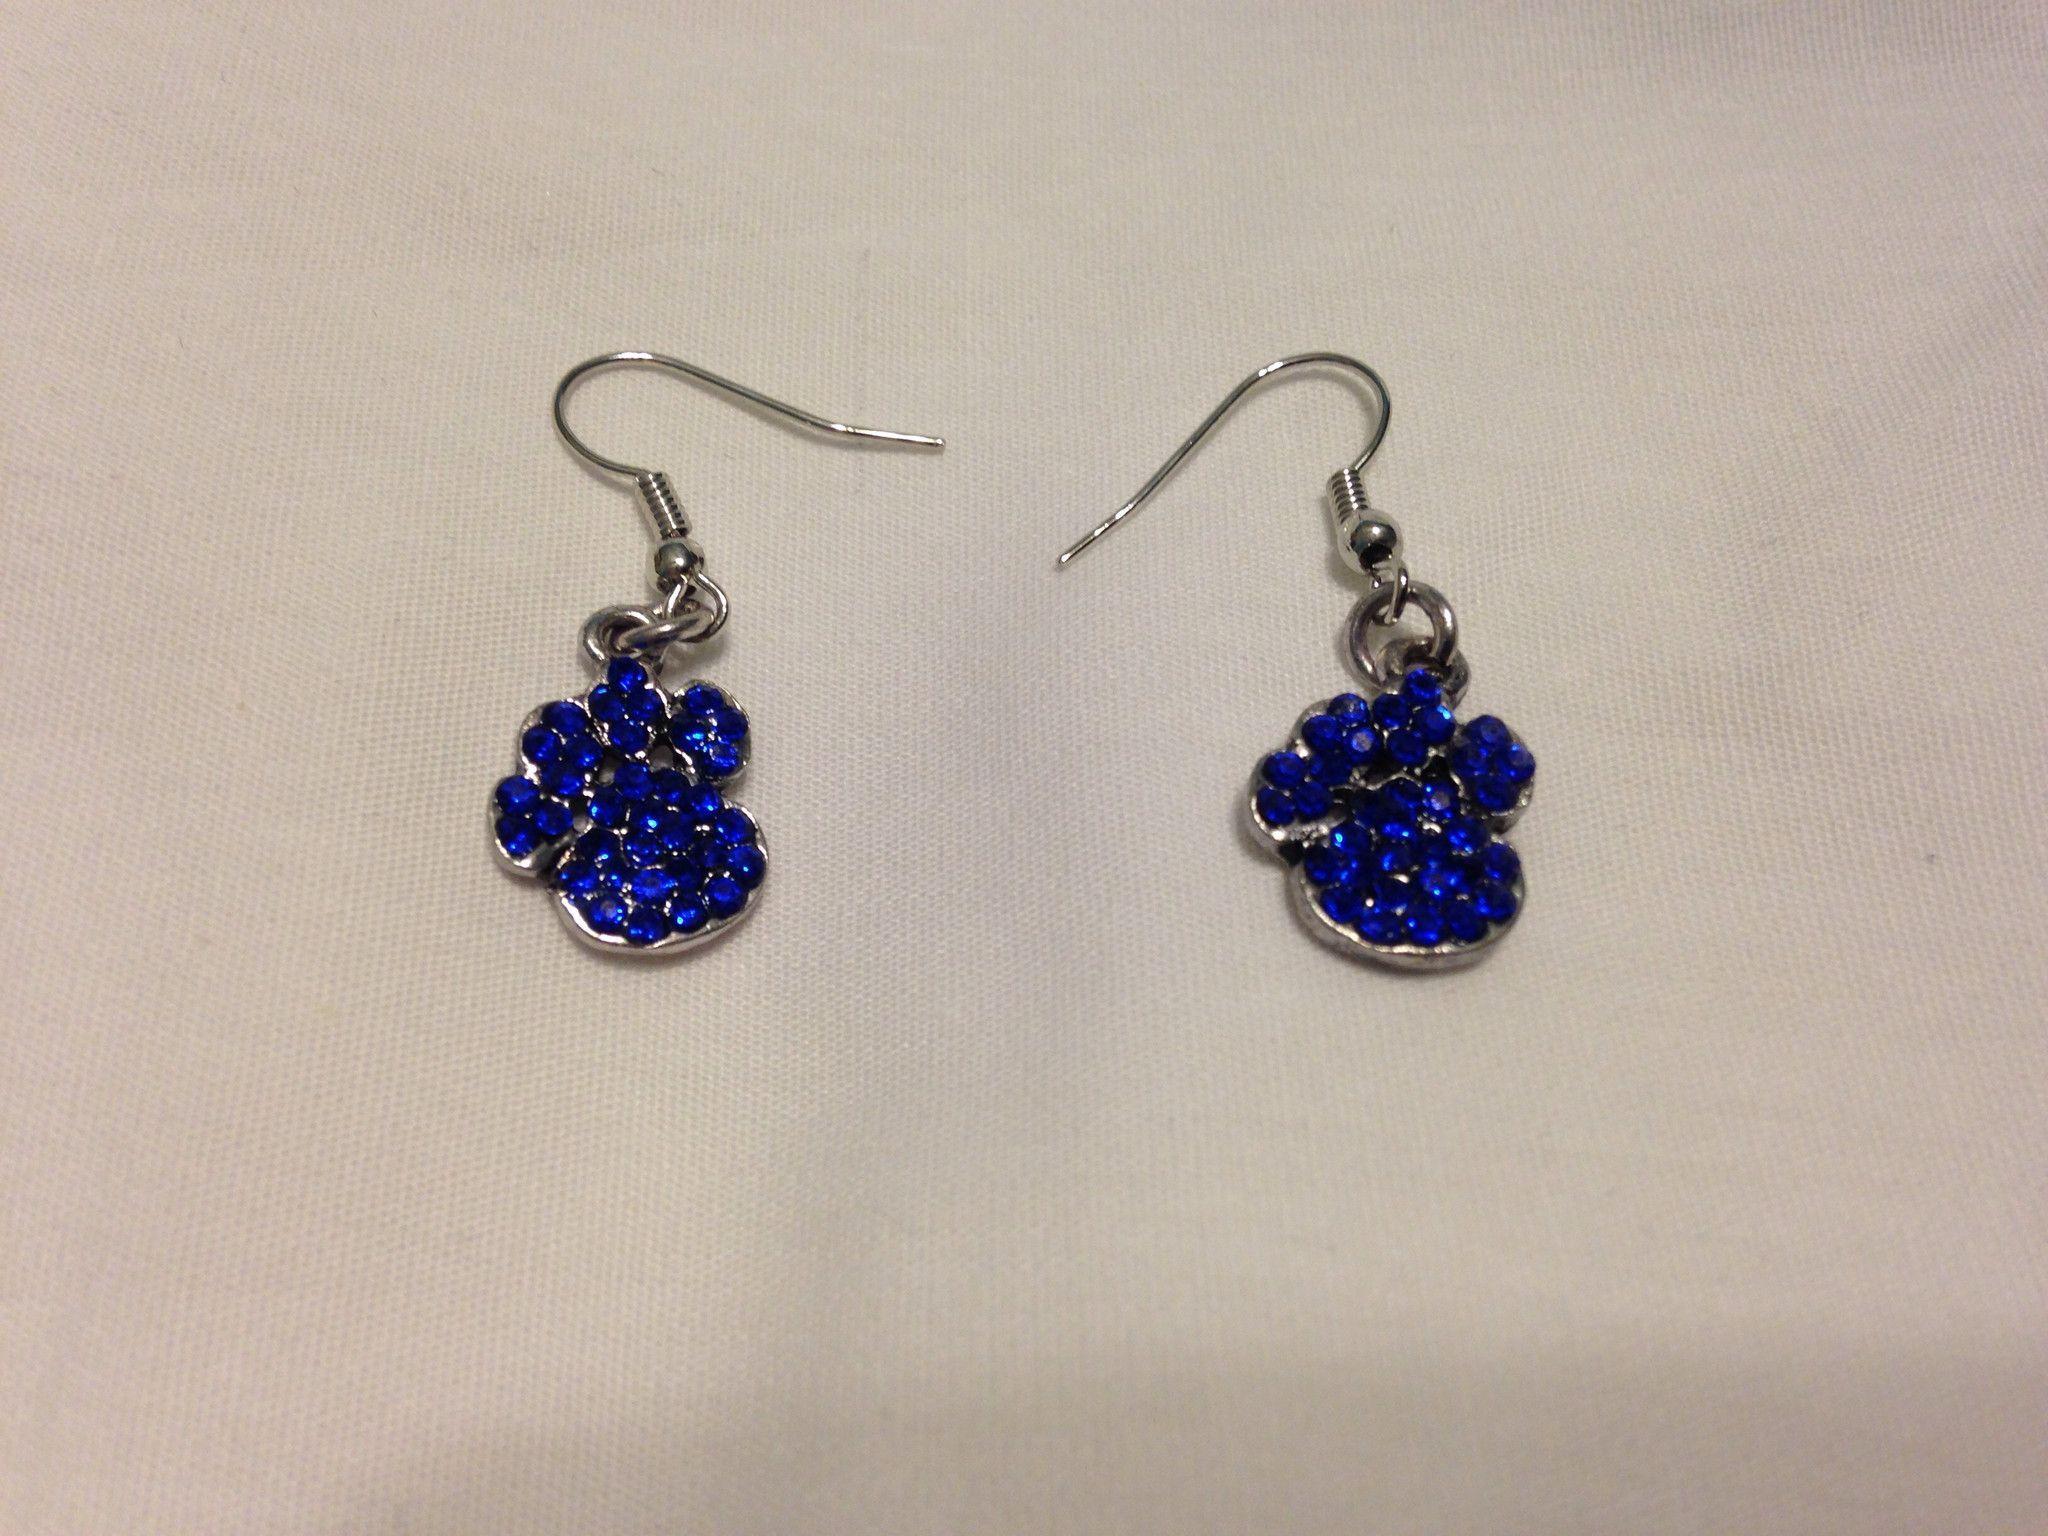 Paw Print Dangle Earrings (XS)